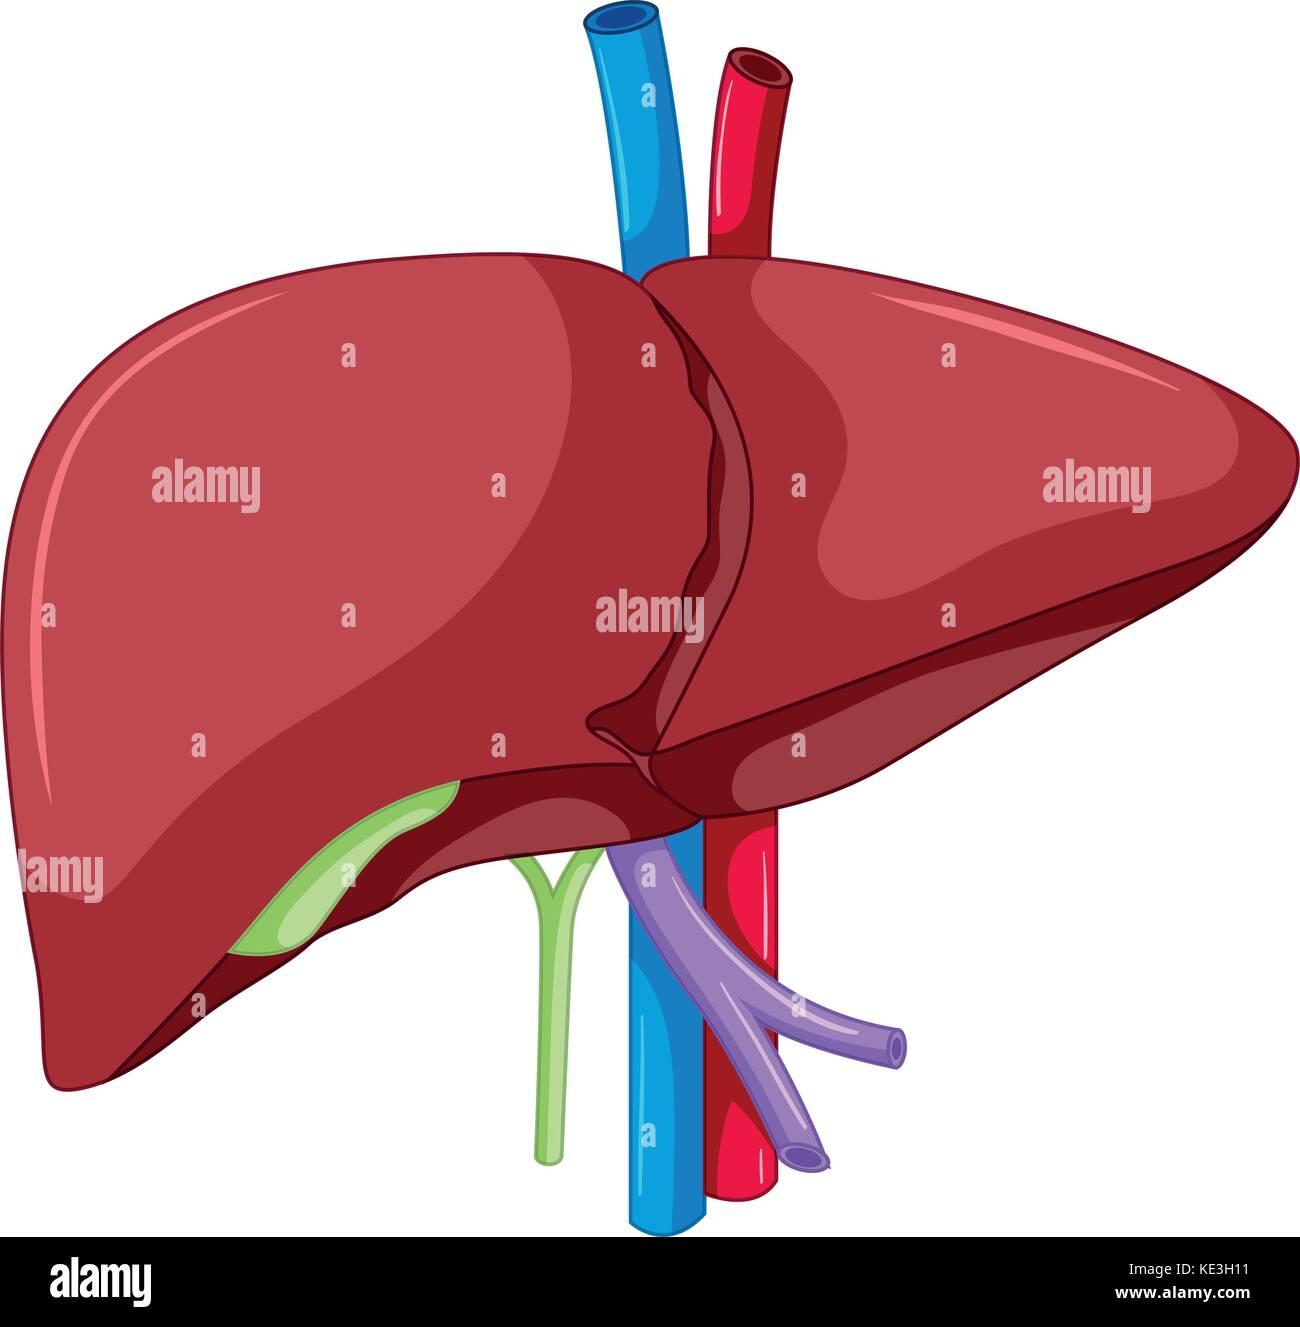 Liver anatomy of human body illustration stock vector art liver anatomy of human body illustration ccuart Choice Image